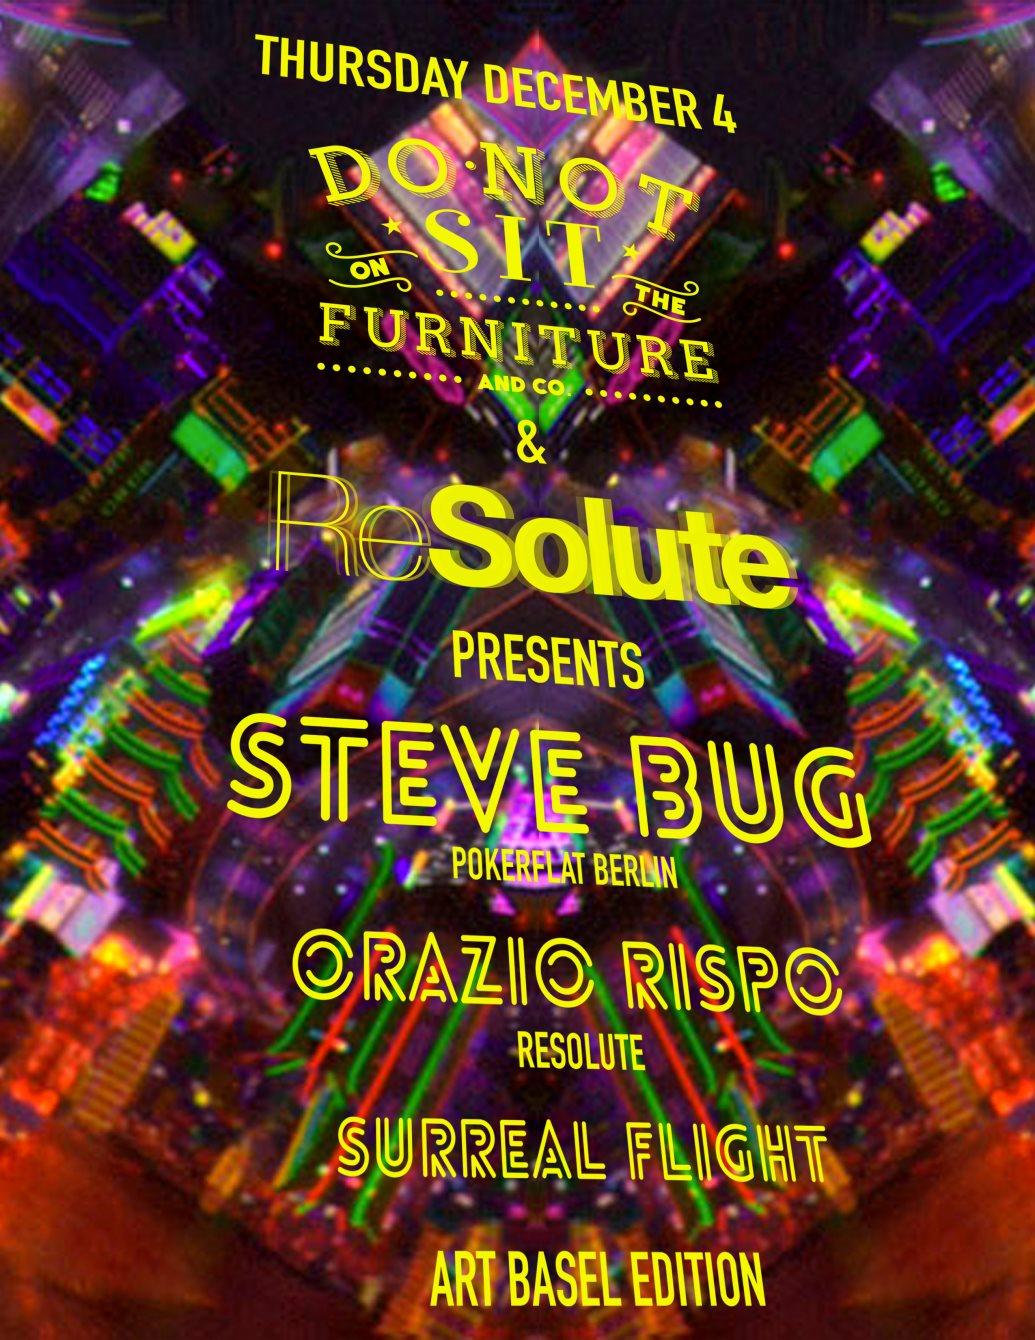 Steve Bug (Art Basel Edition) - Flyer back